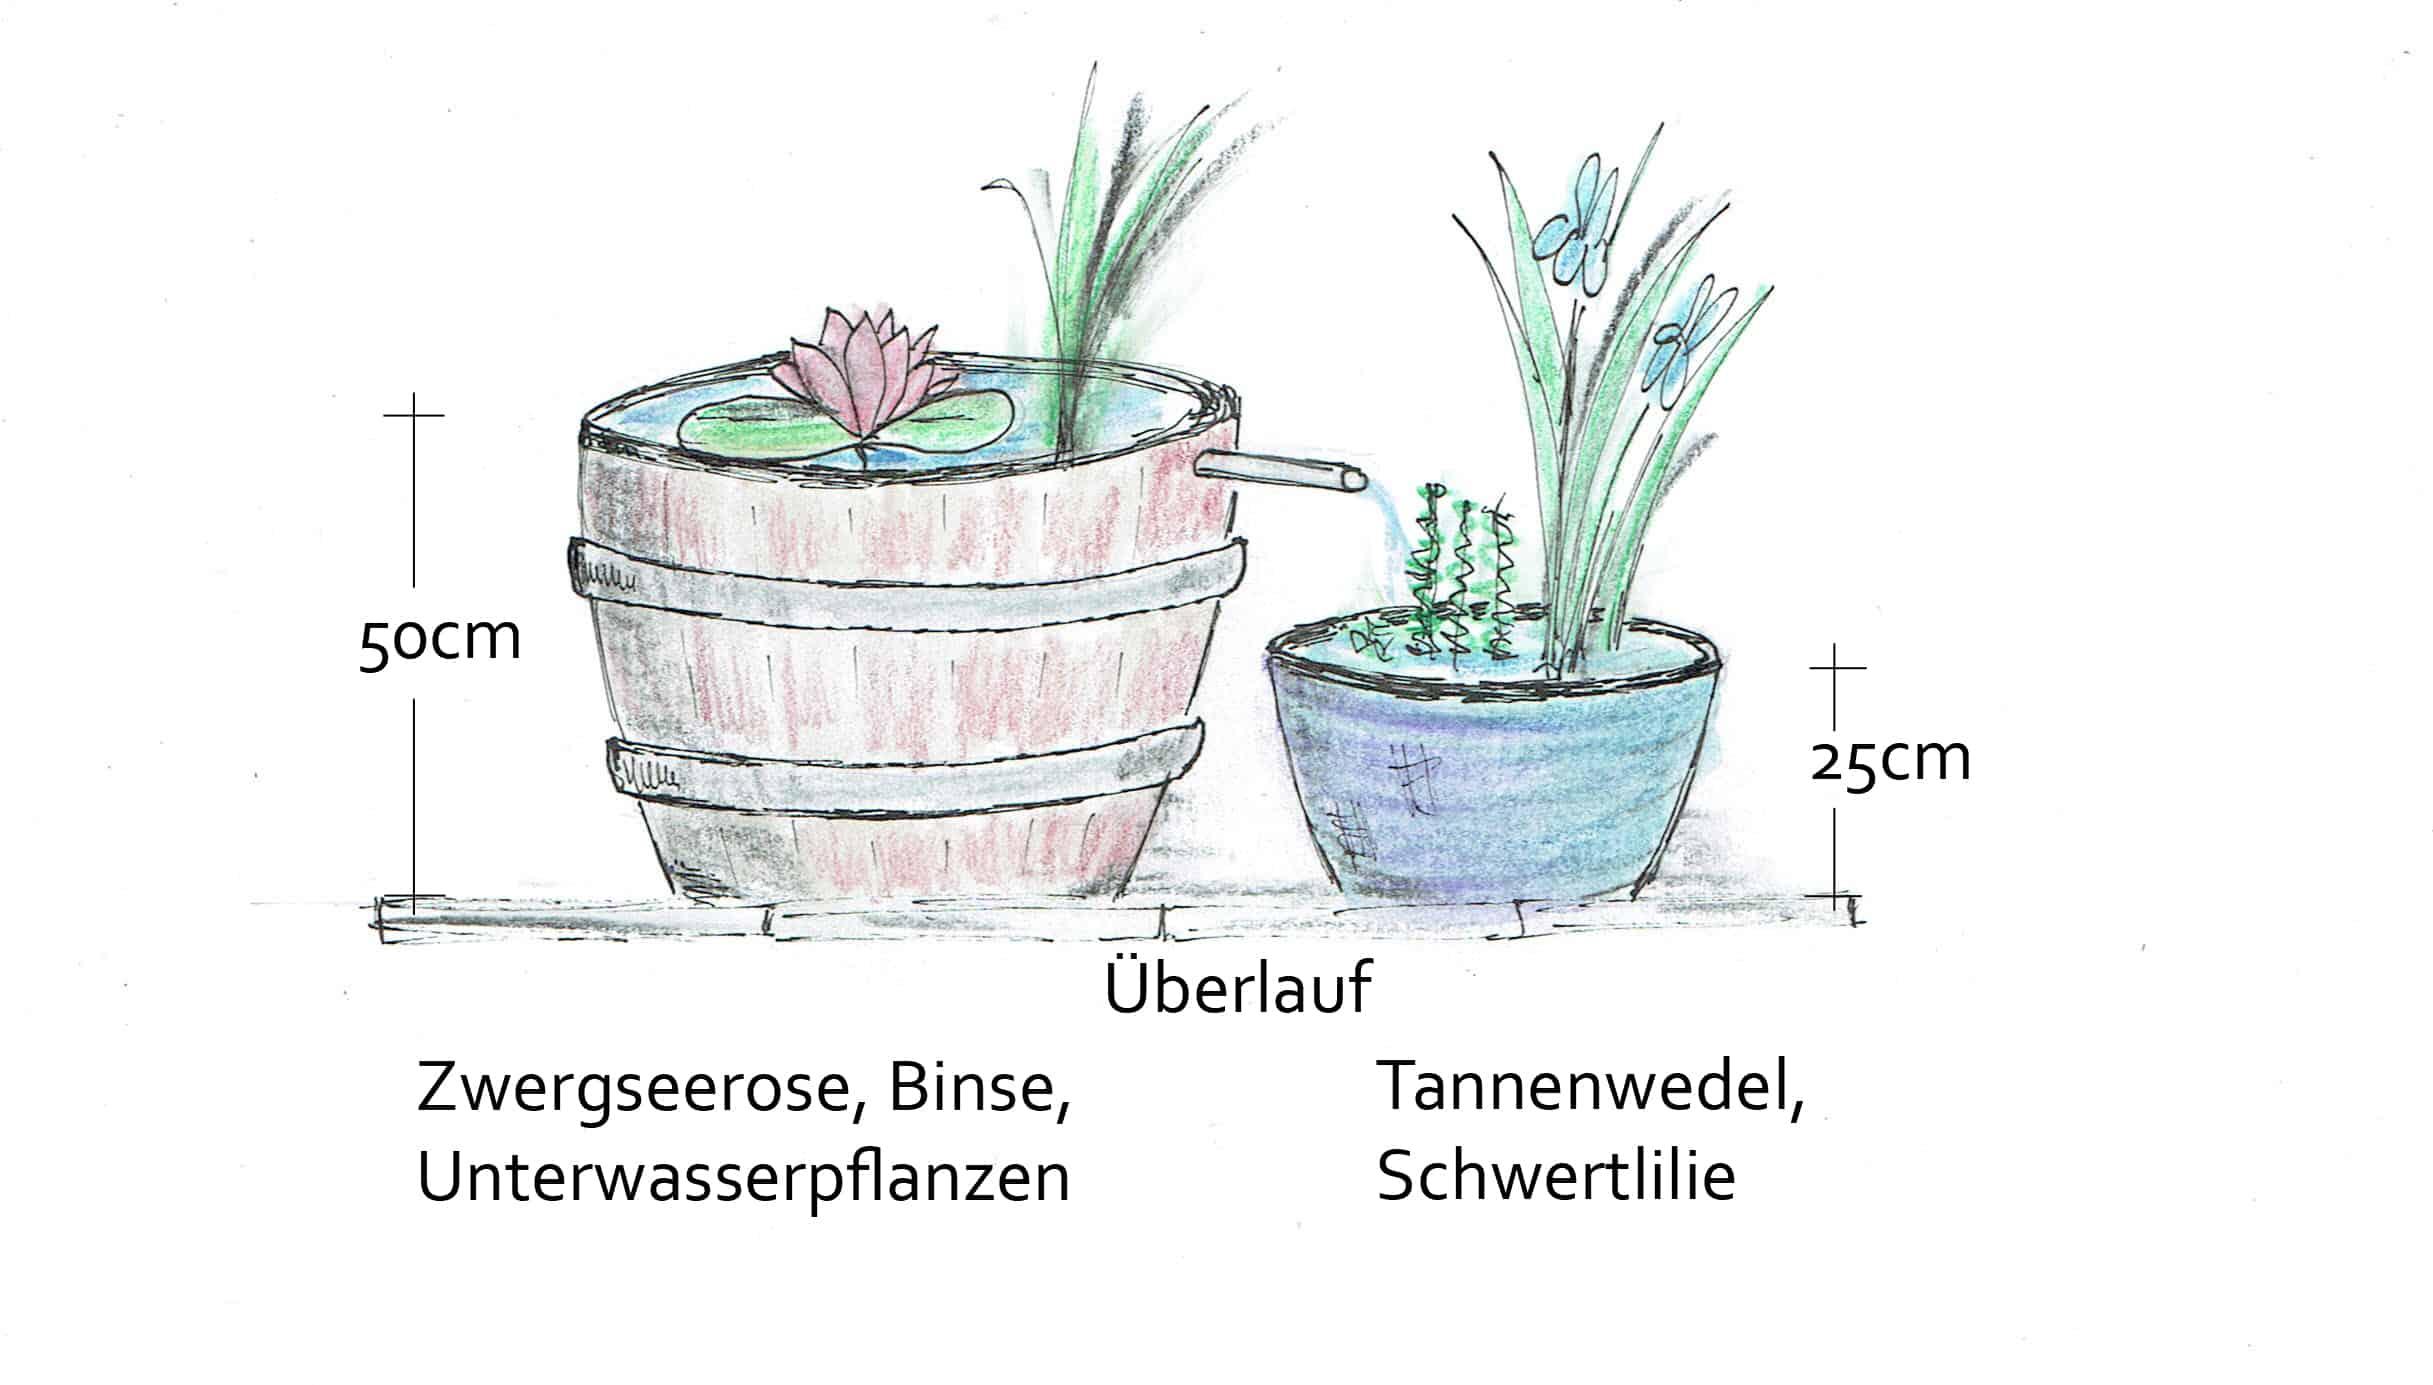 Balkontrogkombination als Miniteiche. Zeichnung: Paula Polak